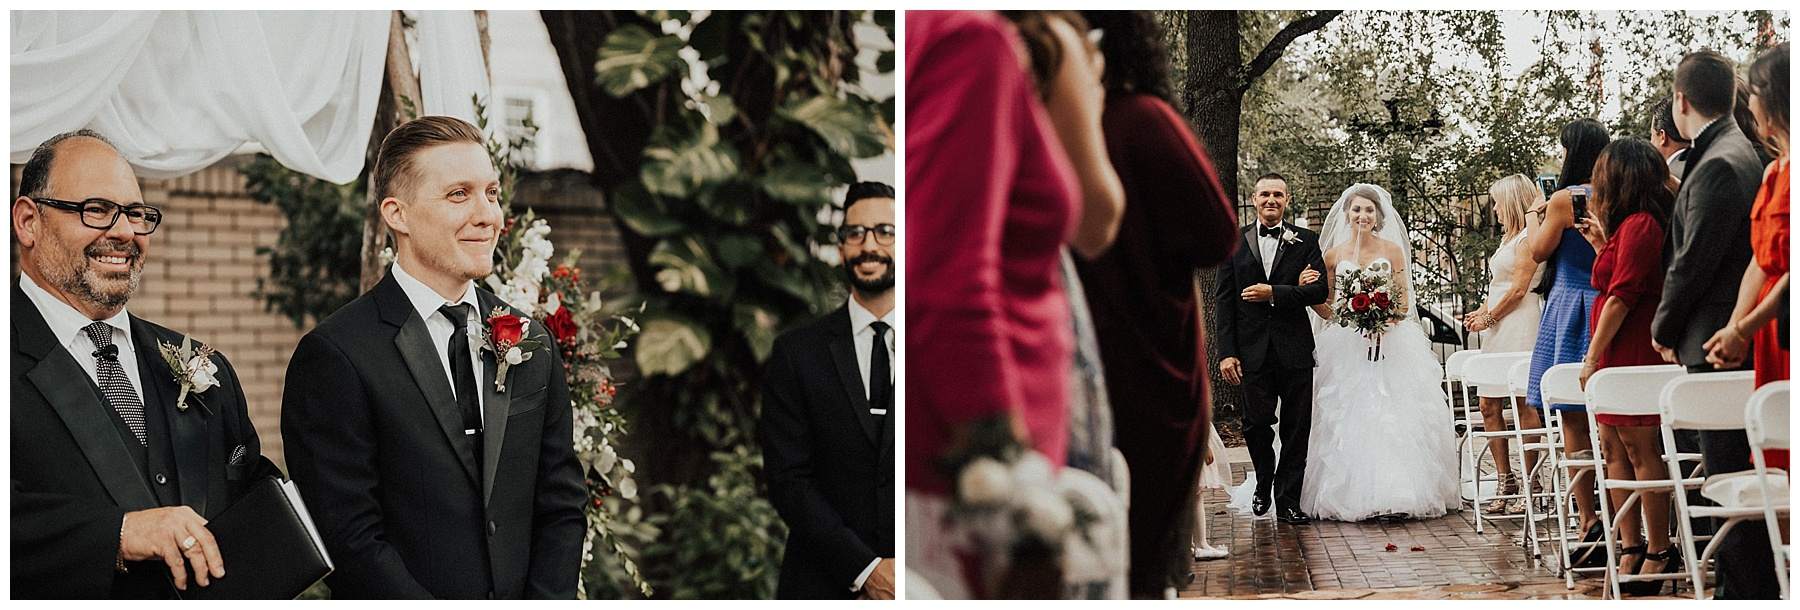 YBOR Wedding Tampa Wedding Photographer-60.jpg